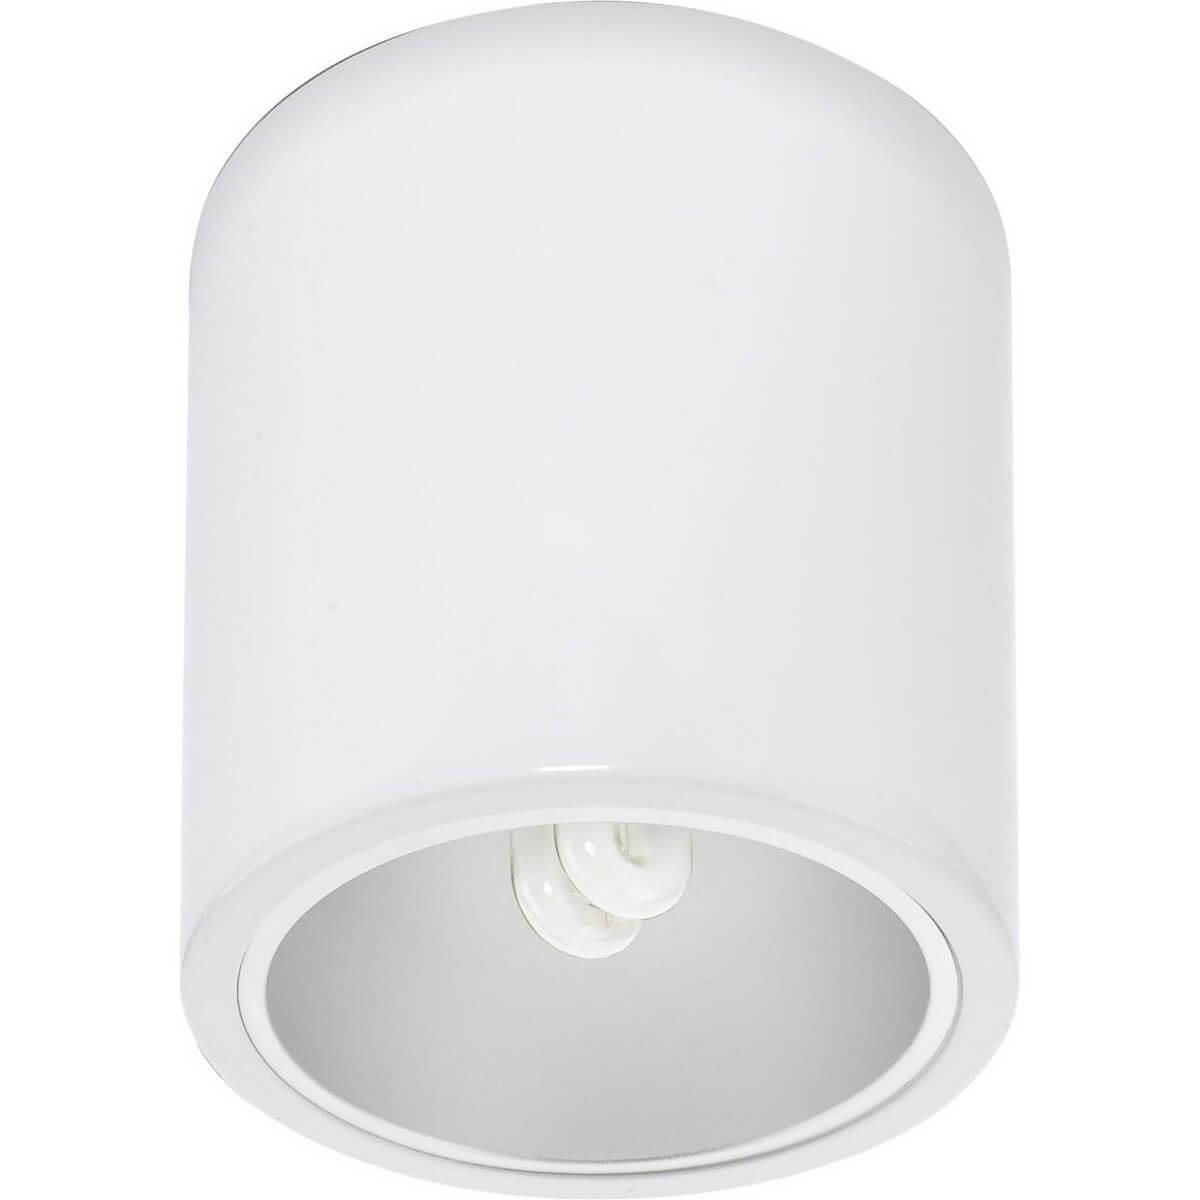 Светильник Nowodvorski 4866 Downlight White